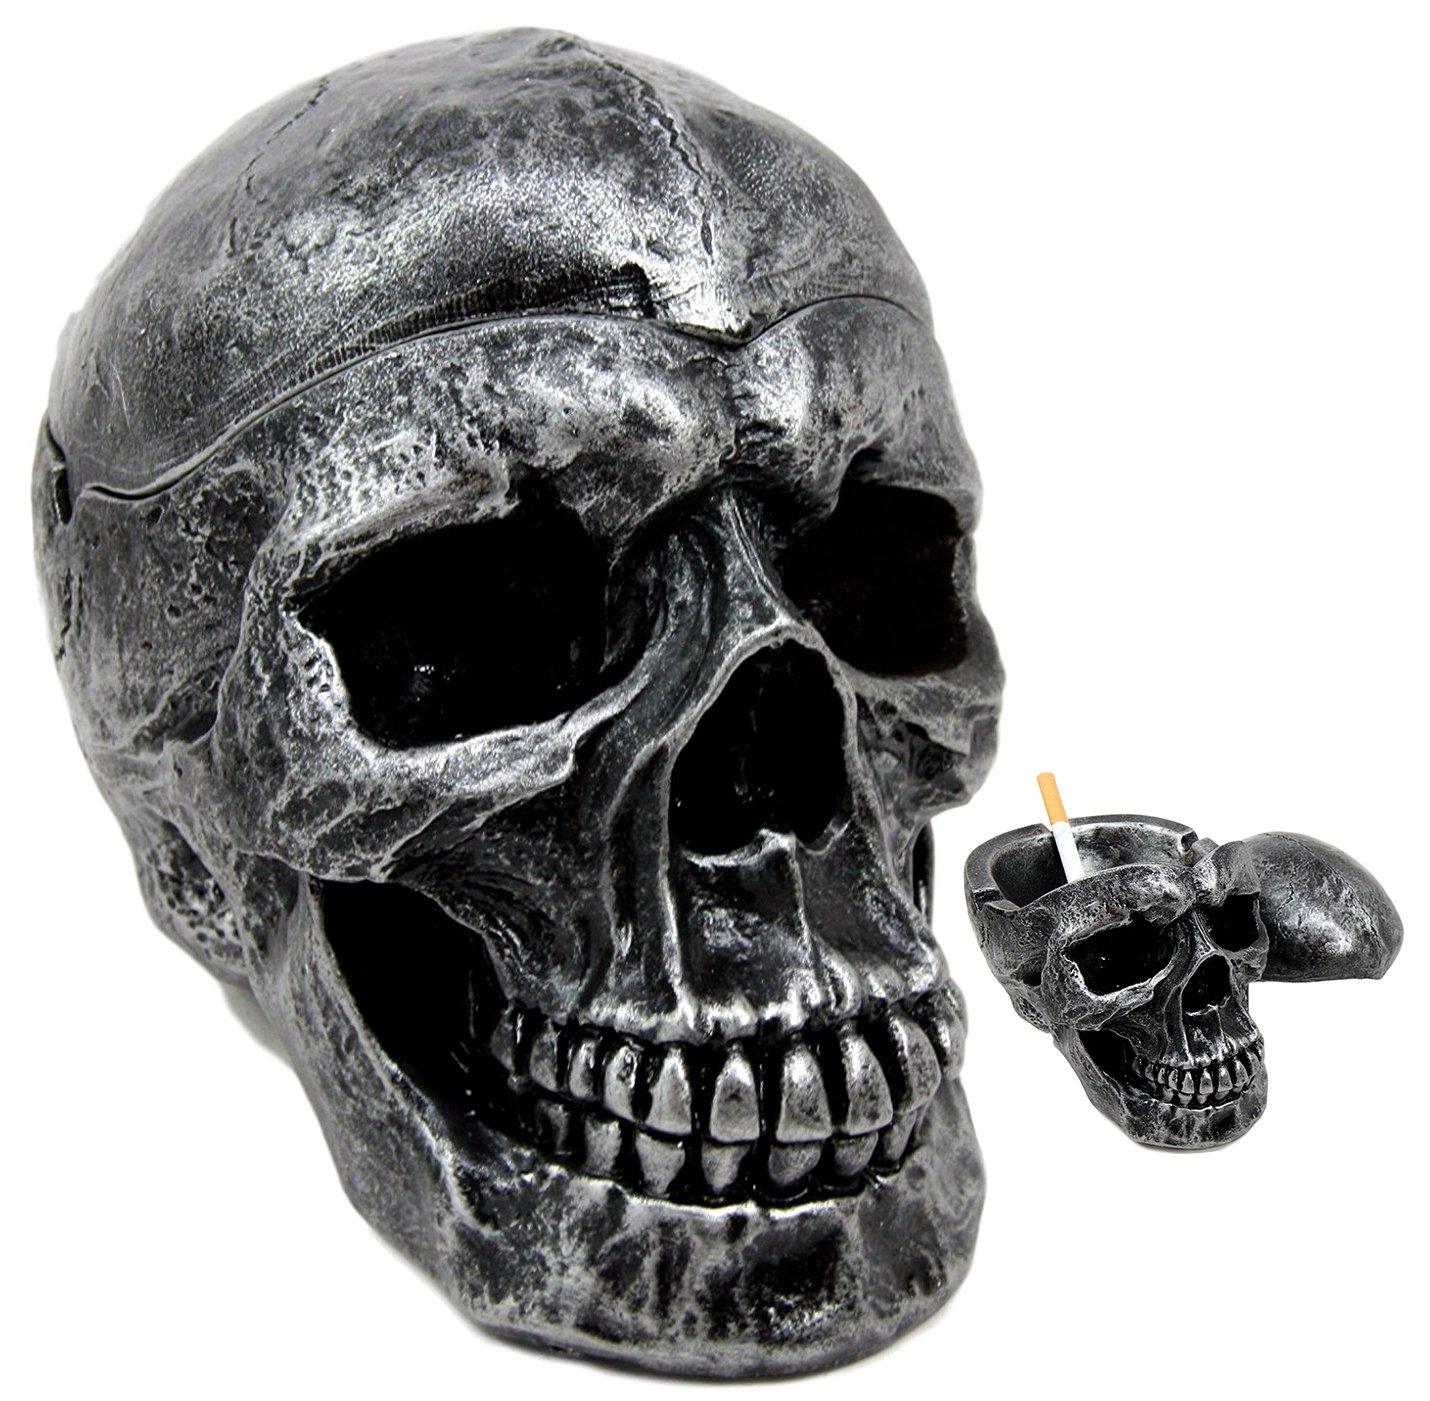 Ebros Death Curse Gothic Metallica Human Skull Ashtray Resin Figurine Day Of The Dead Halloween Spooky Decor Cigarette Ashtray With Lid